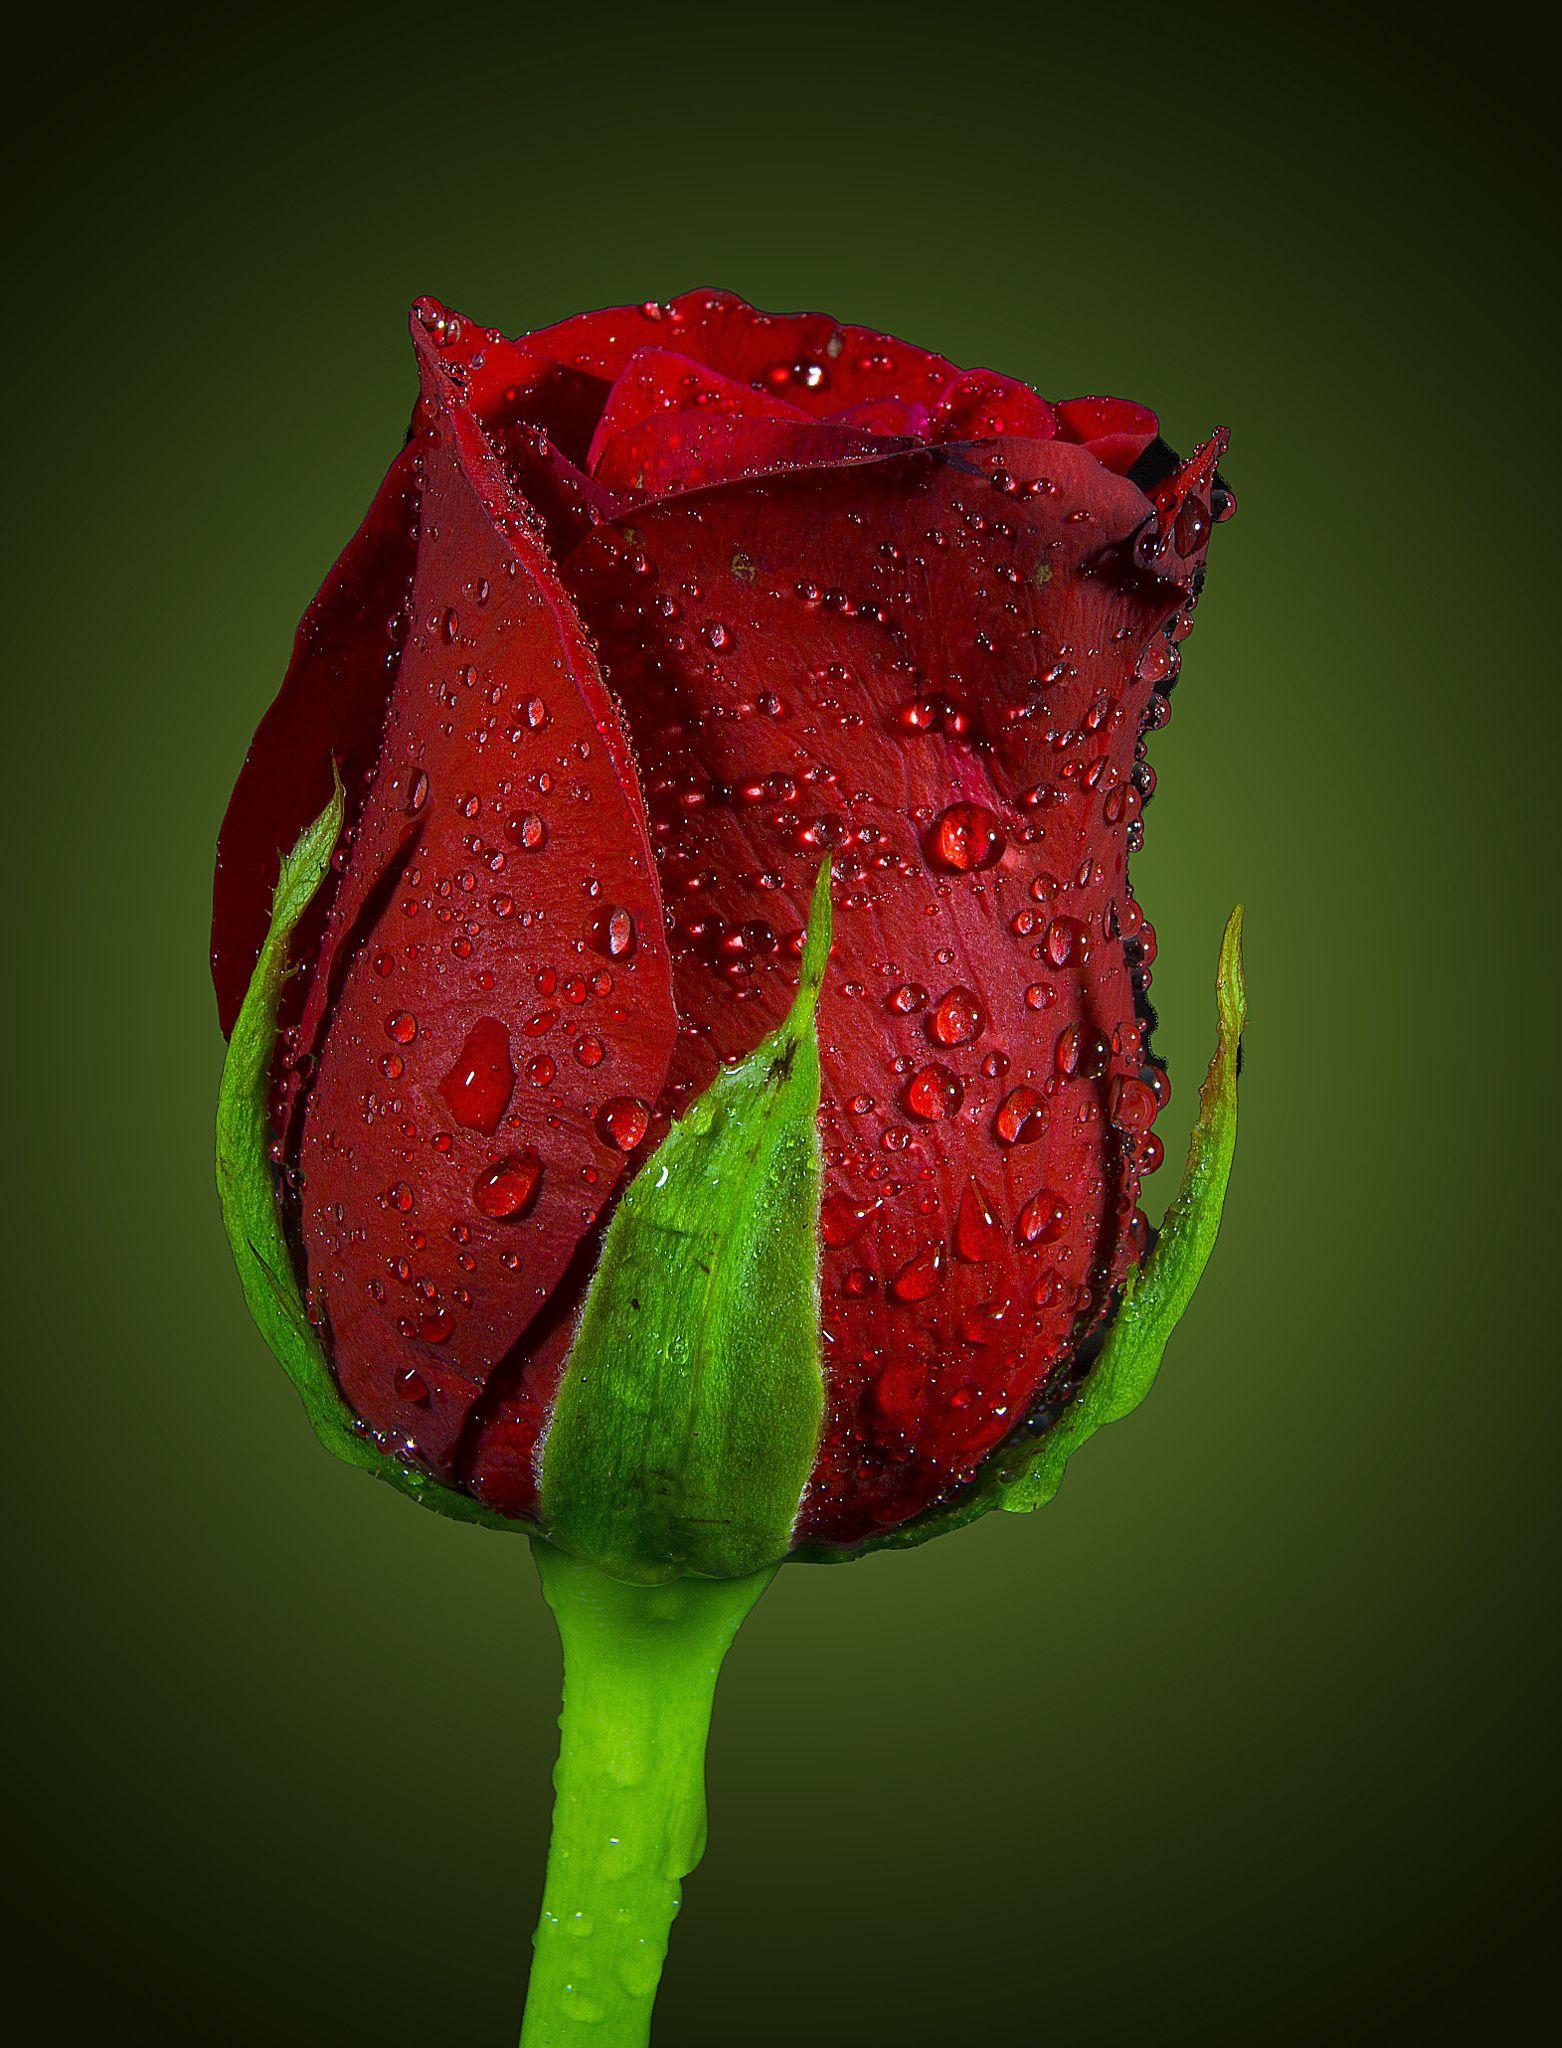 Emotional Heart Beautiful Red Roses Beautiful Rose Flowers Beautiful Flowers Wallpapers